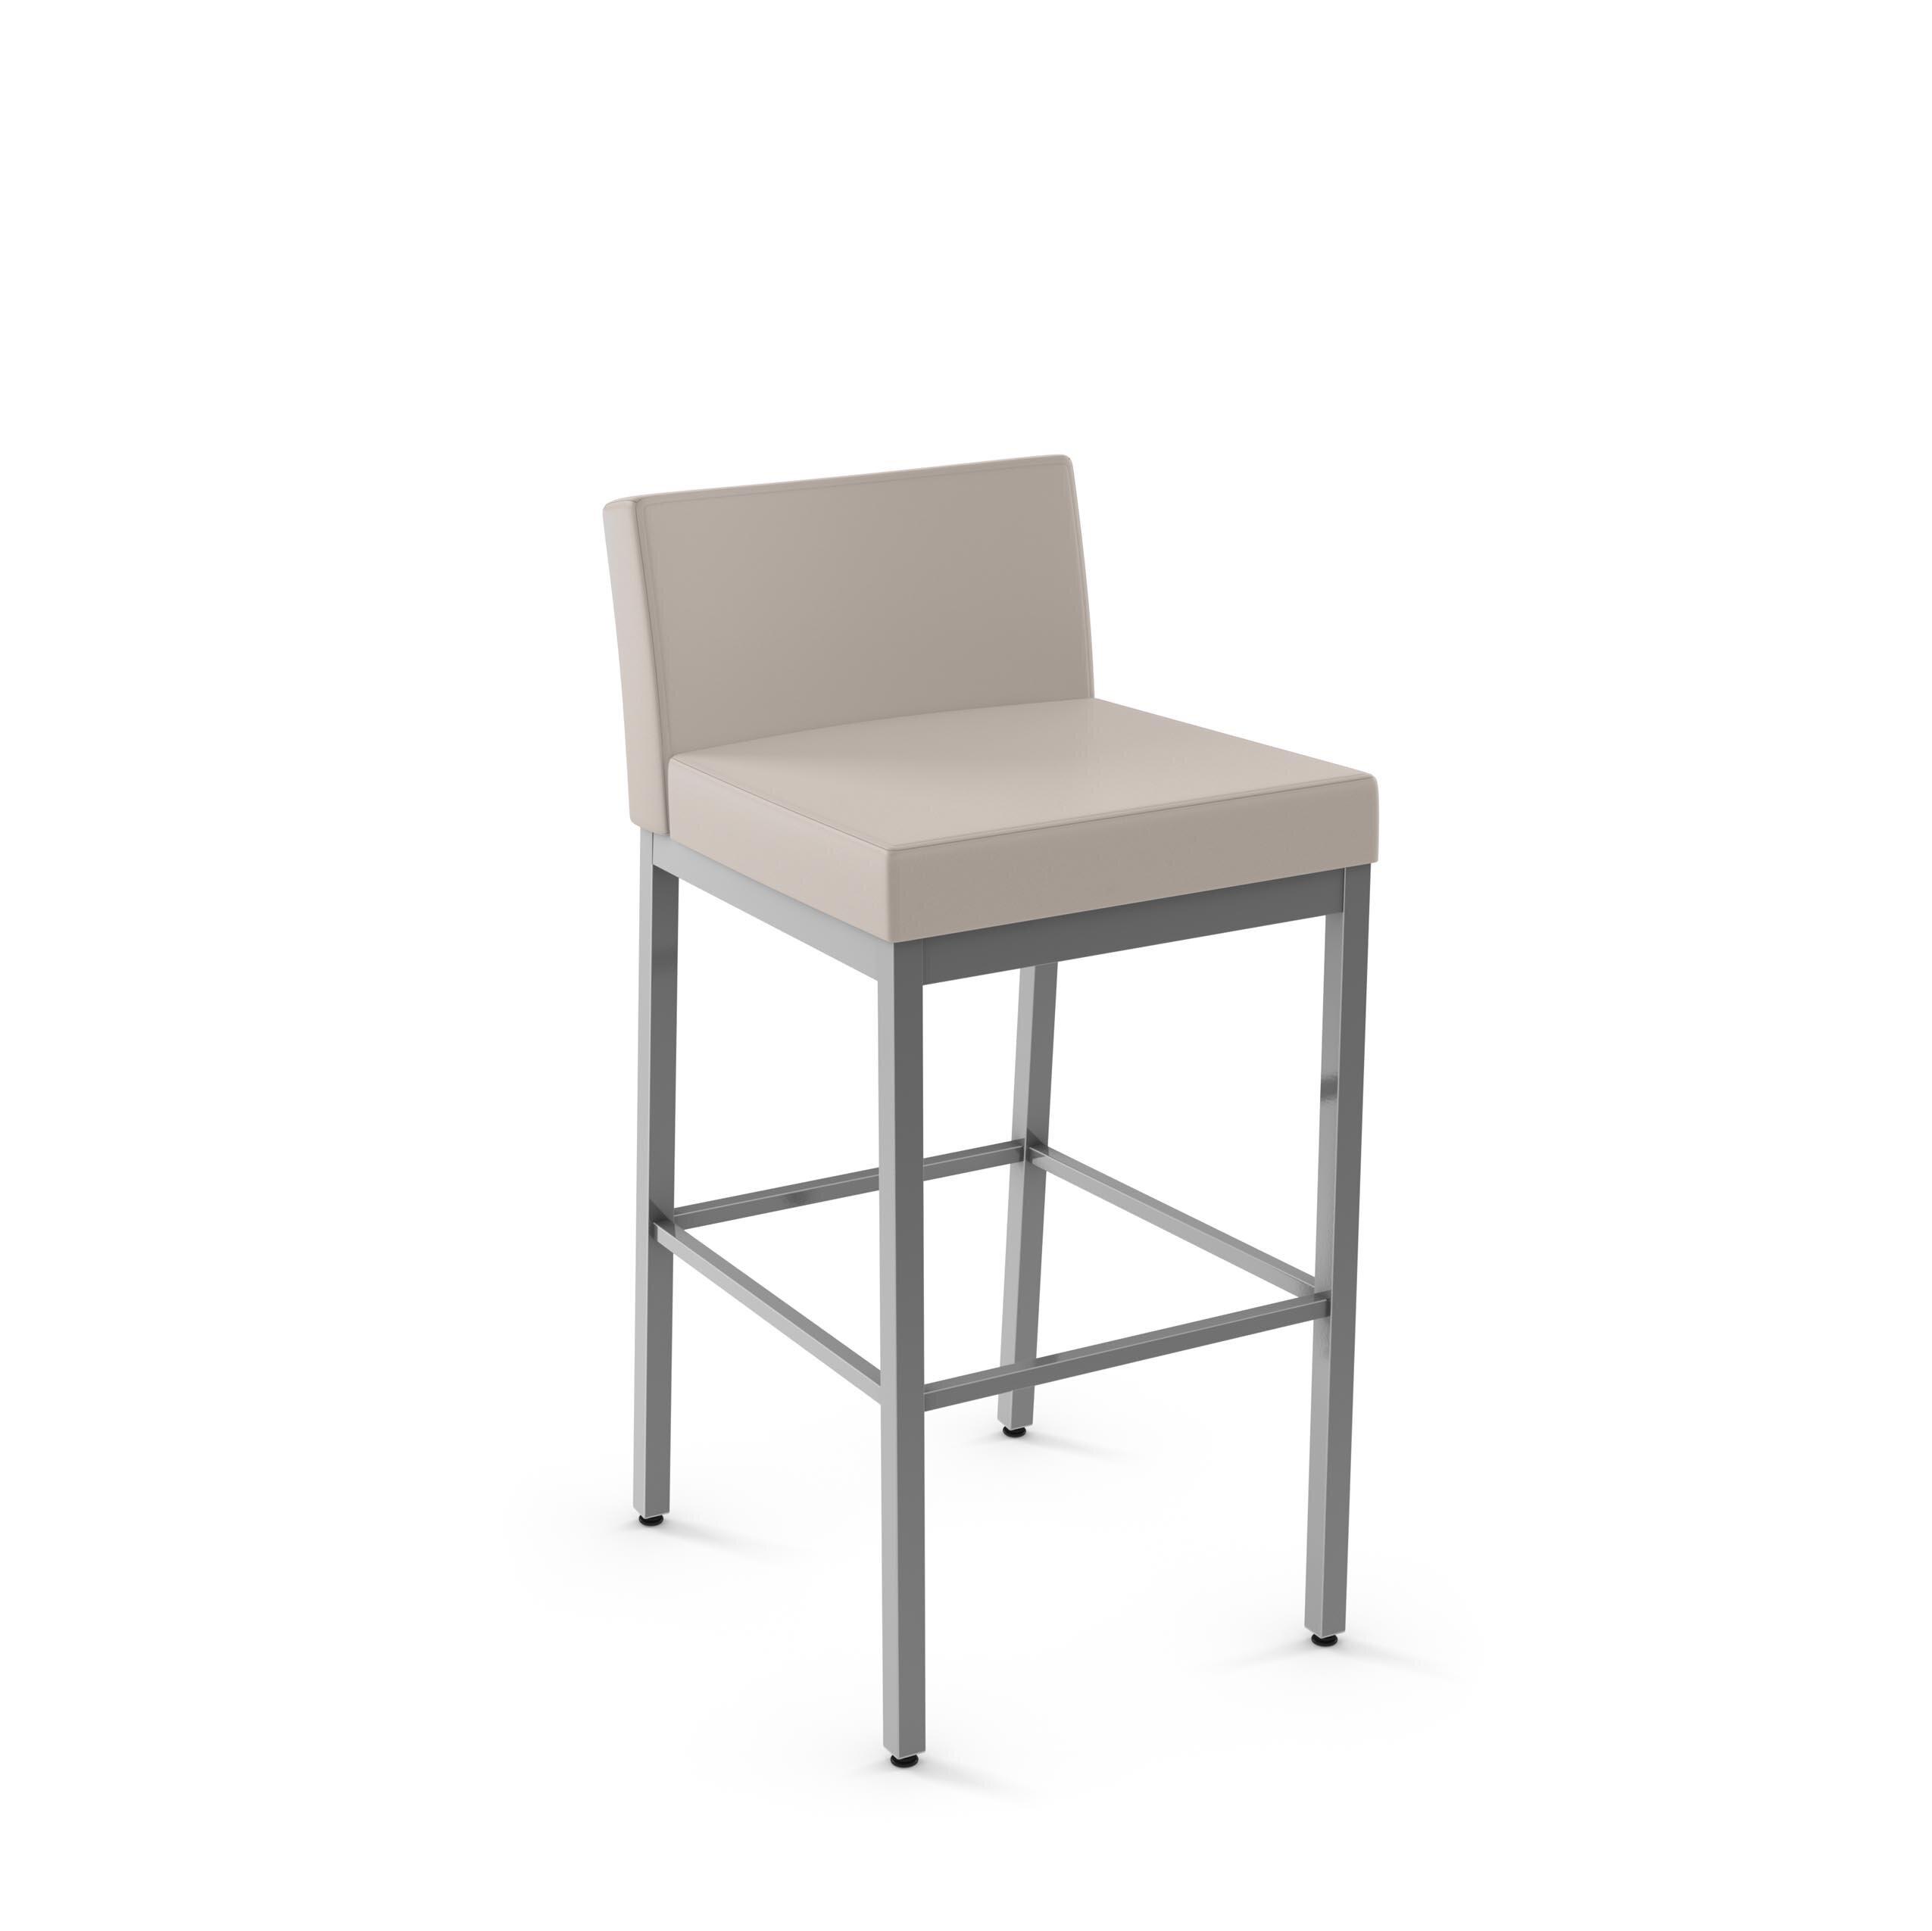 Fabulous Amisco Fairfield 26 Bar Stool Reviews Wayfair Inzonedesignstudio Interior Chair Design Inzonedesignstudiocom